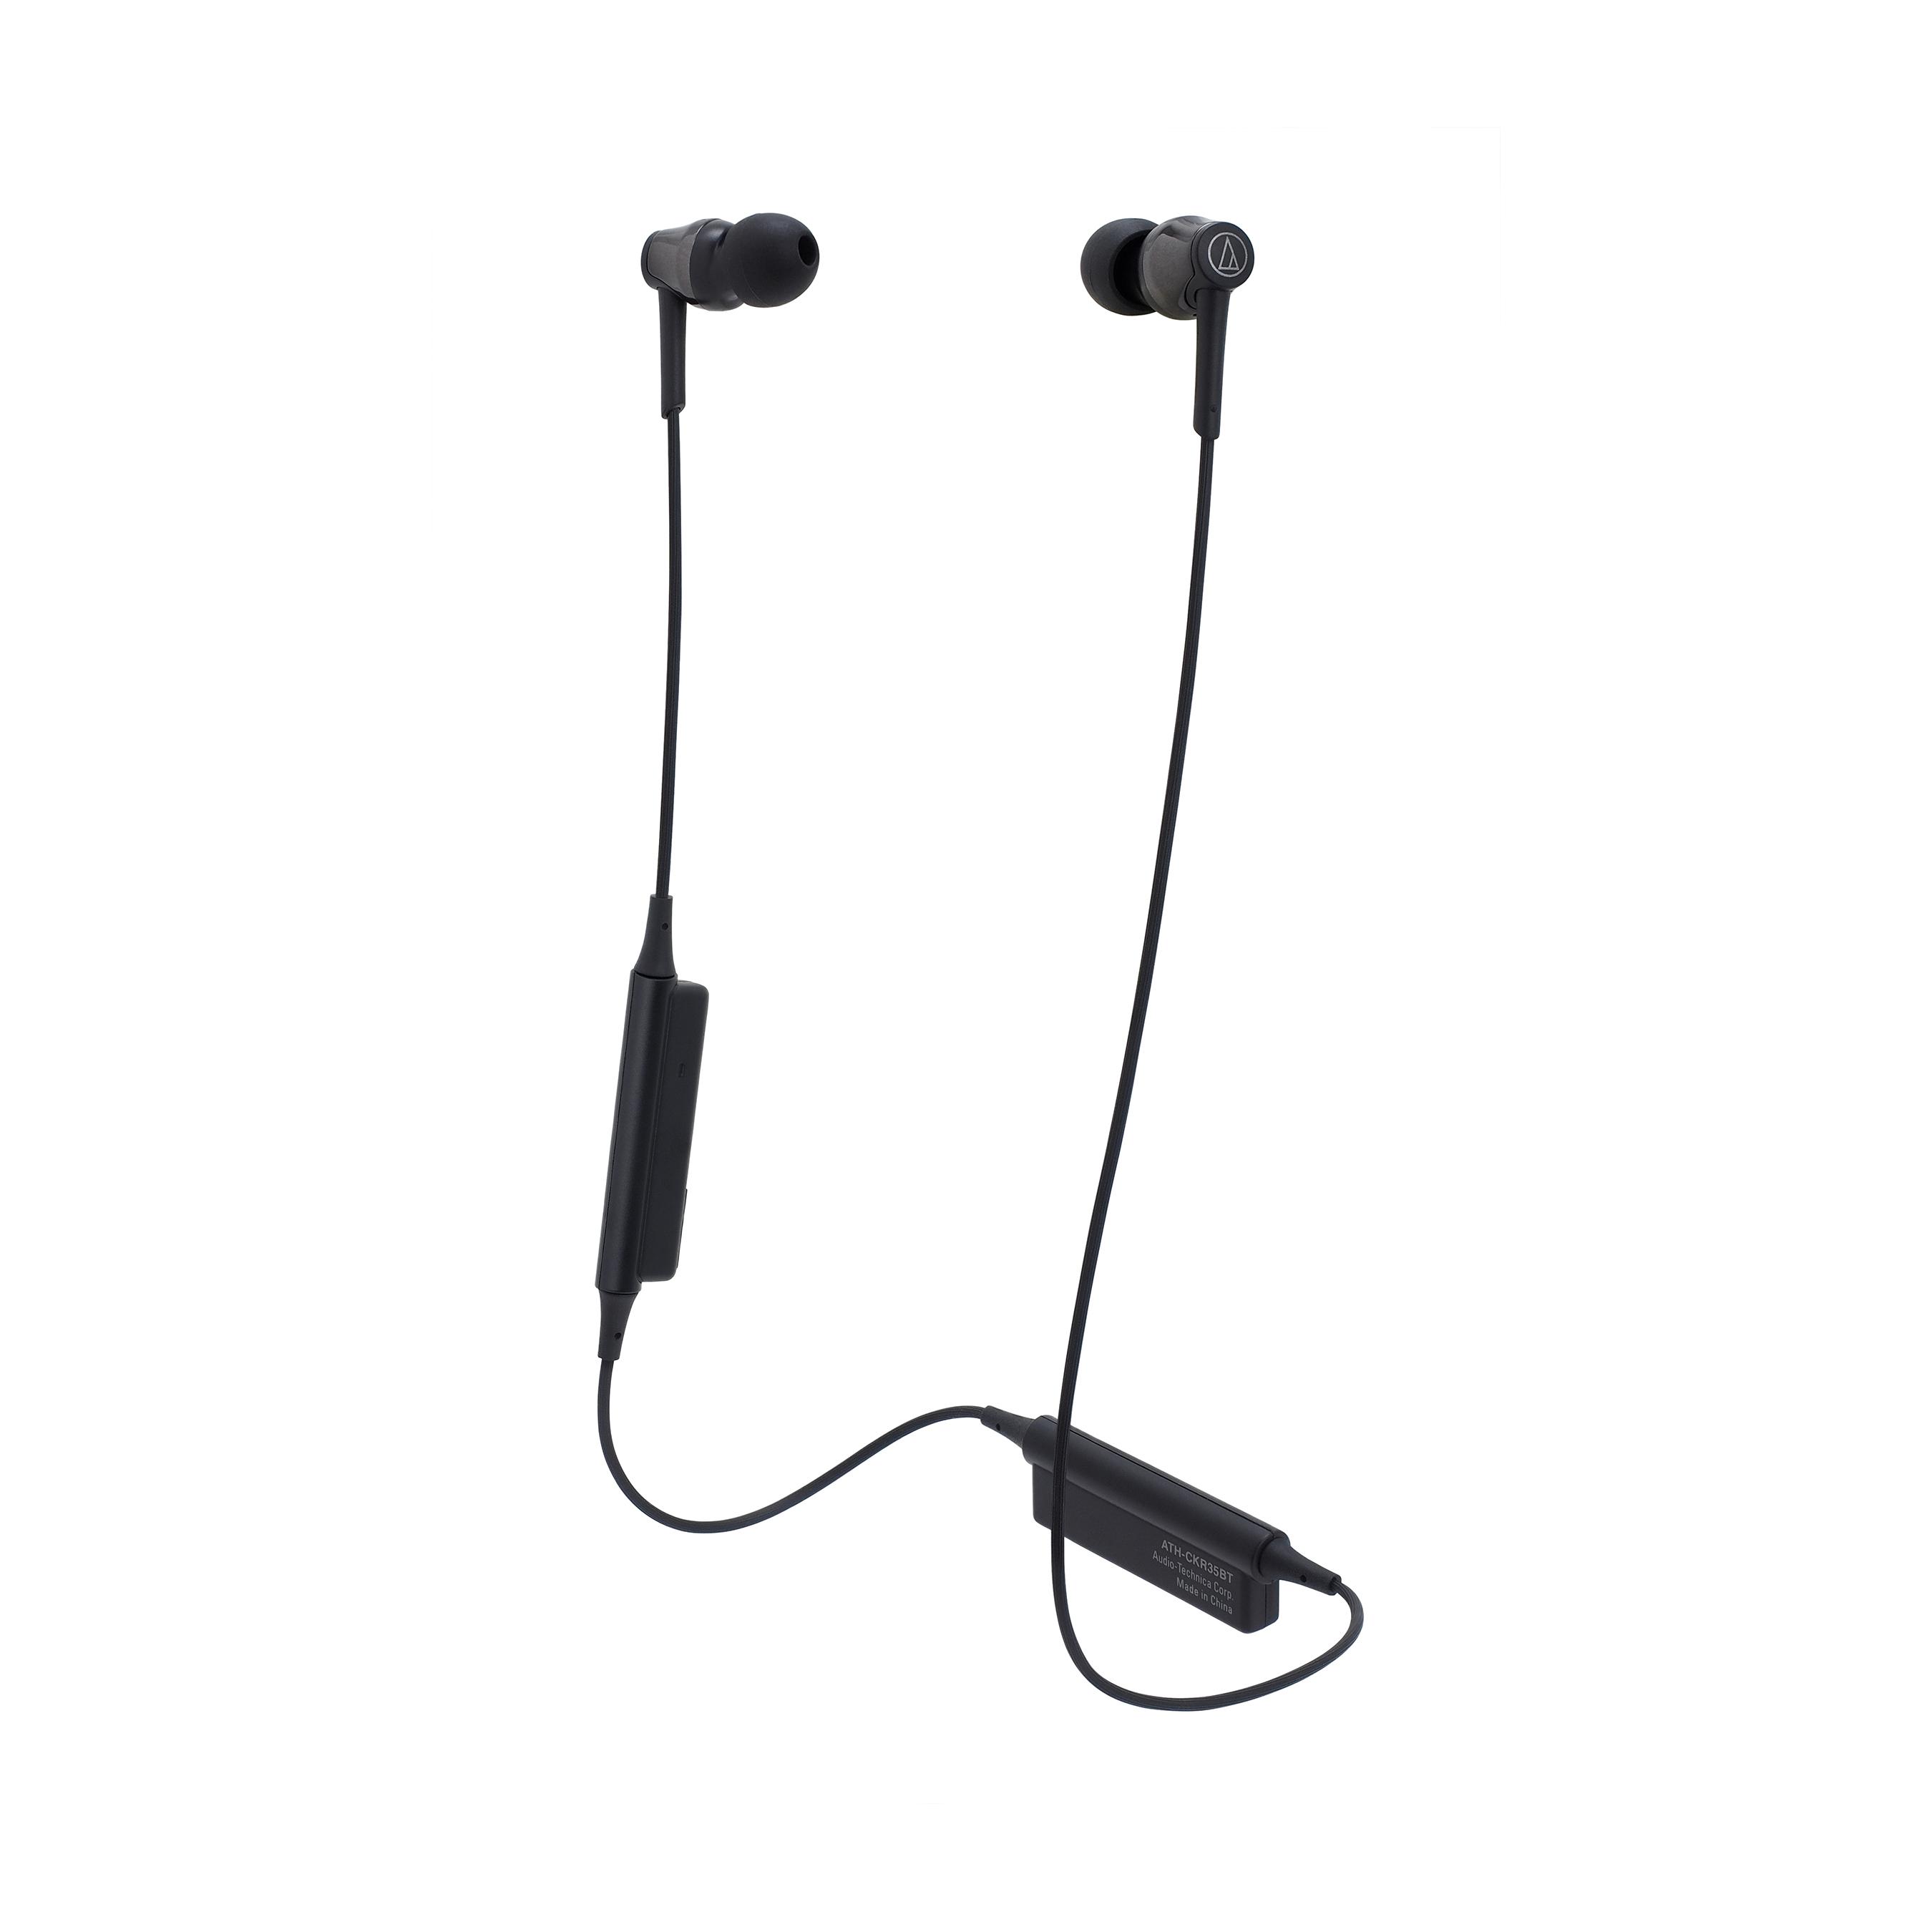 Tai nghe bluetooth Audio Technica ATH-CKR35BTBK